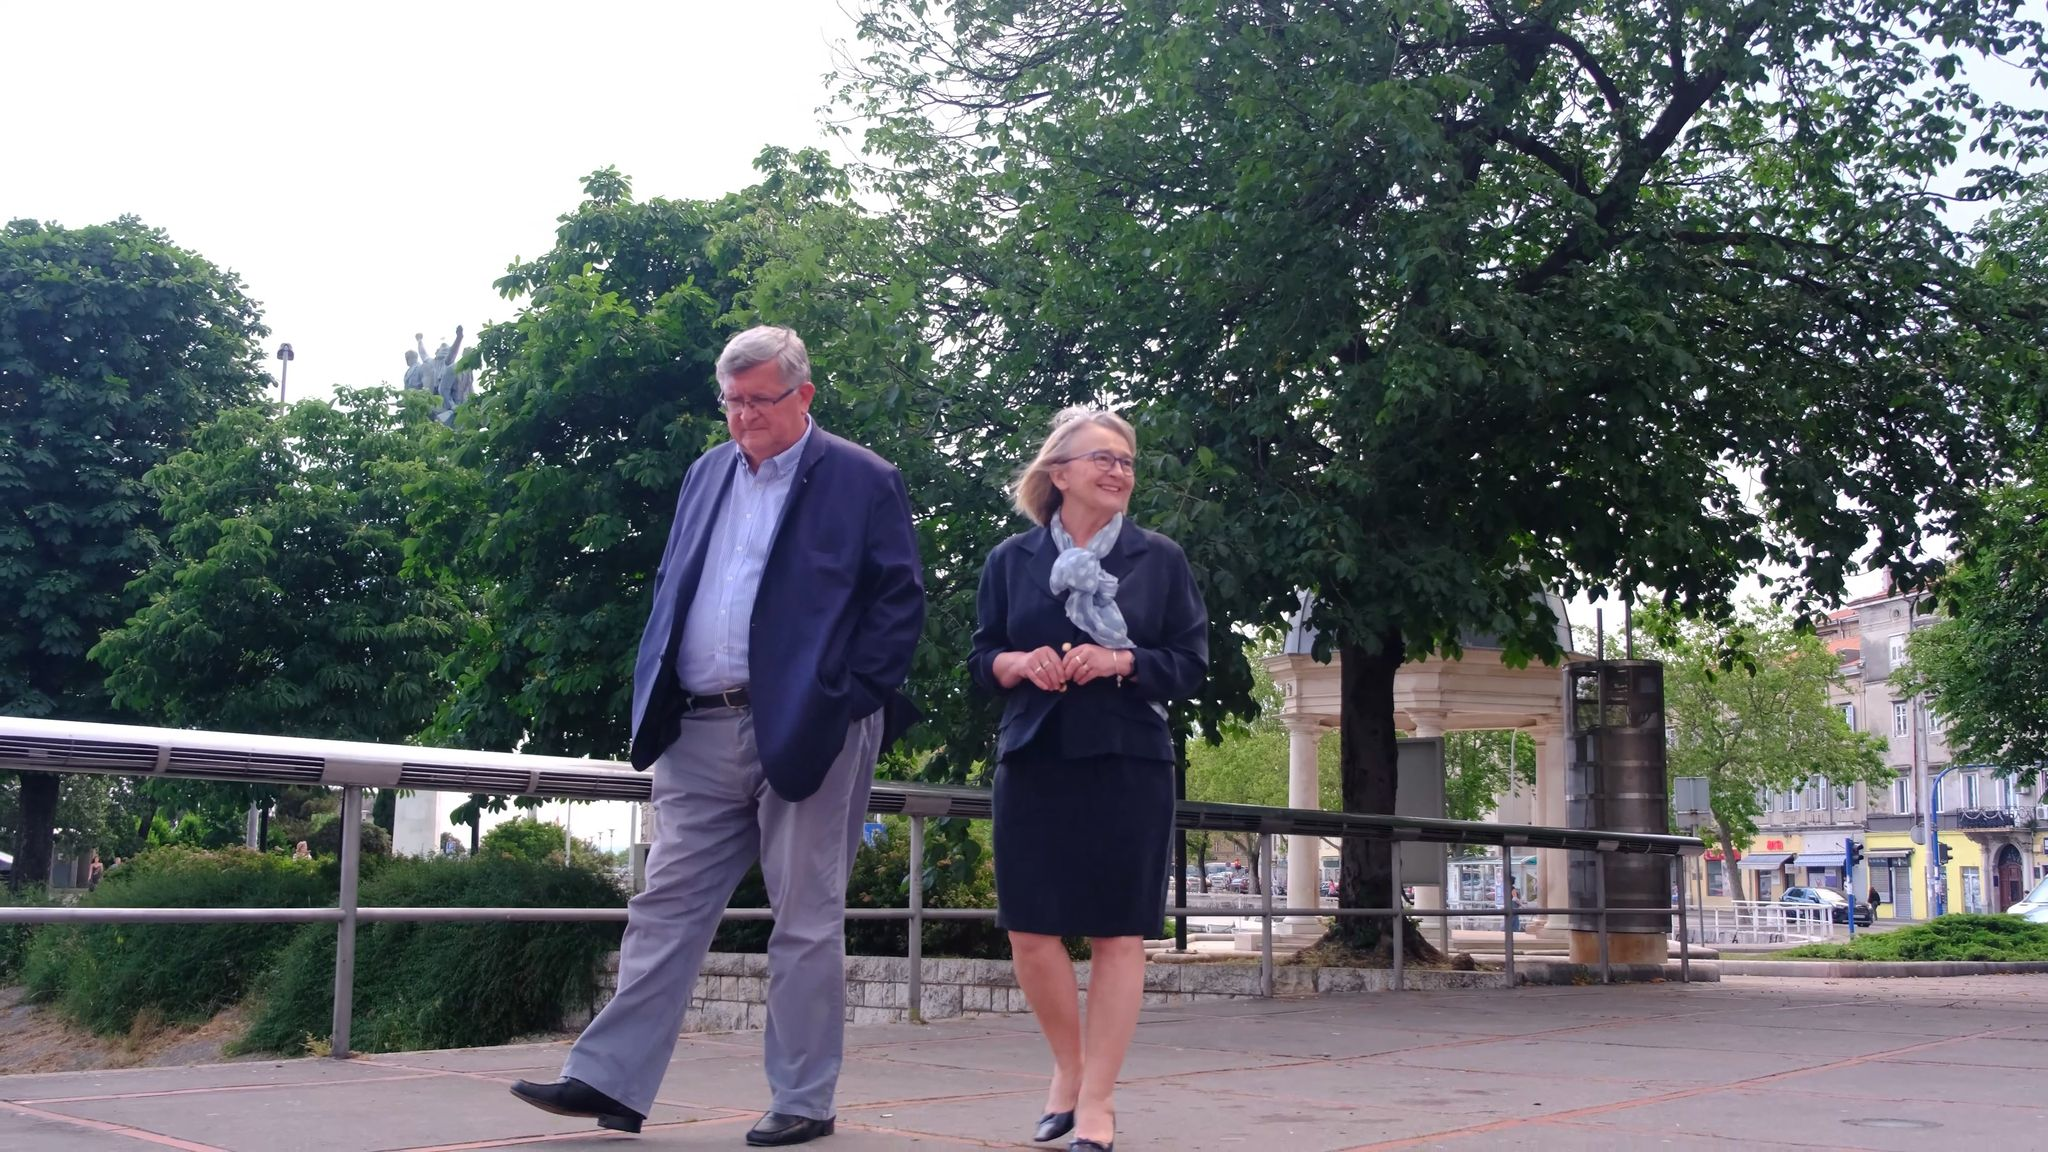 Extravagant couple: Branka i Vojko Obersnel